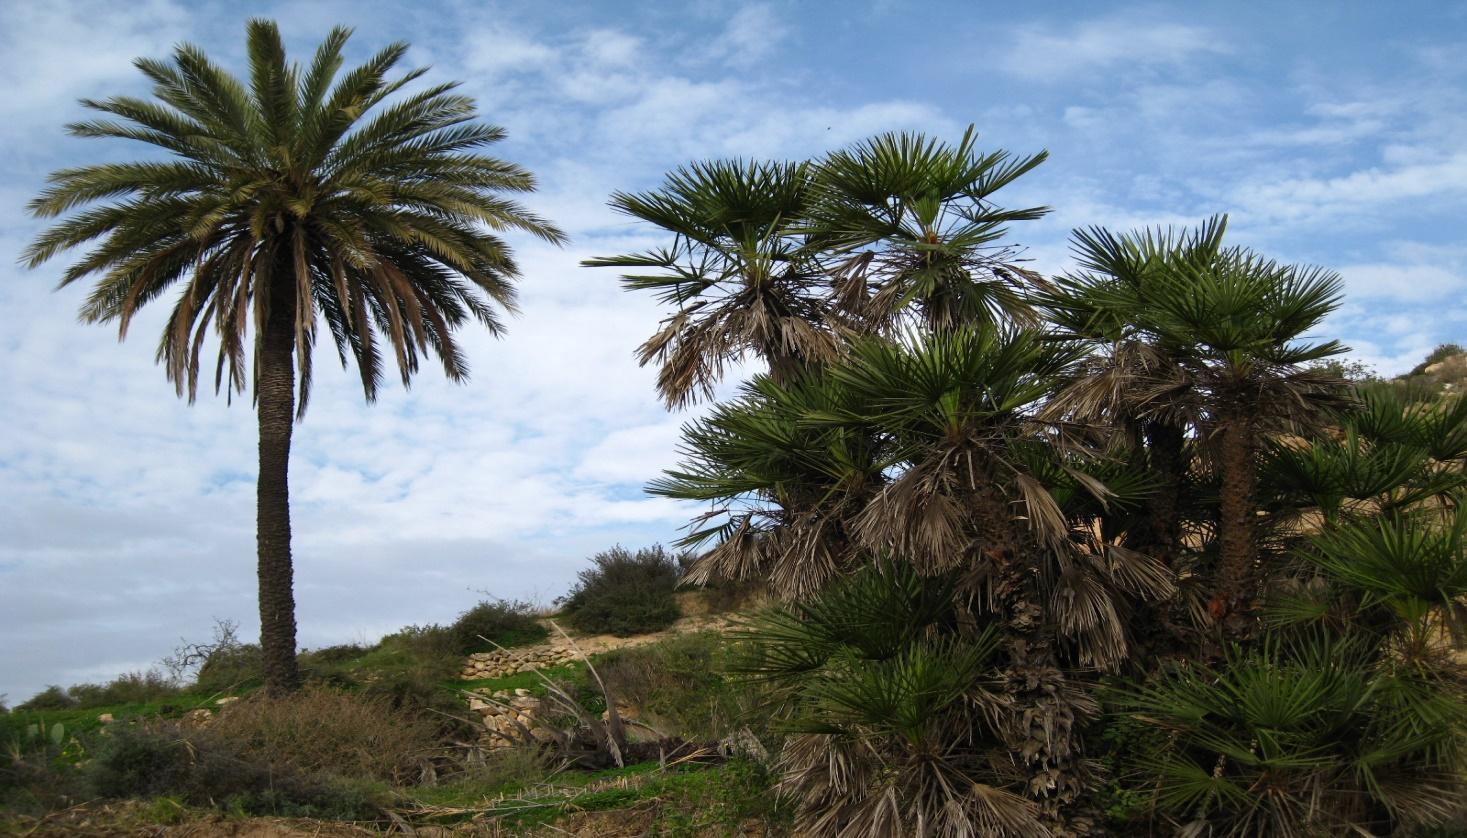 I:\NO\SENDA\2 - Sendero del Agua (Galifa)\FOTOS\Nueva carpeta\image005.jpg